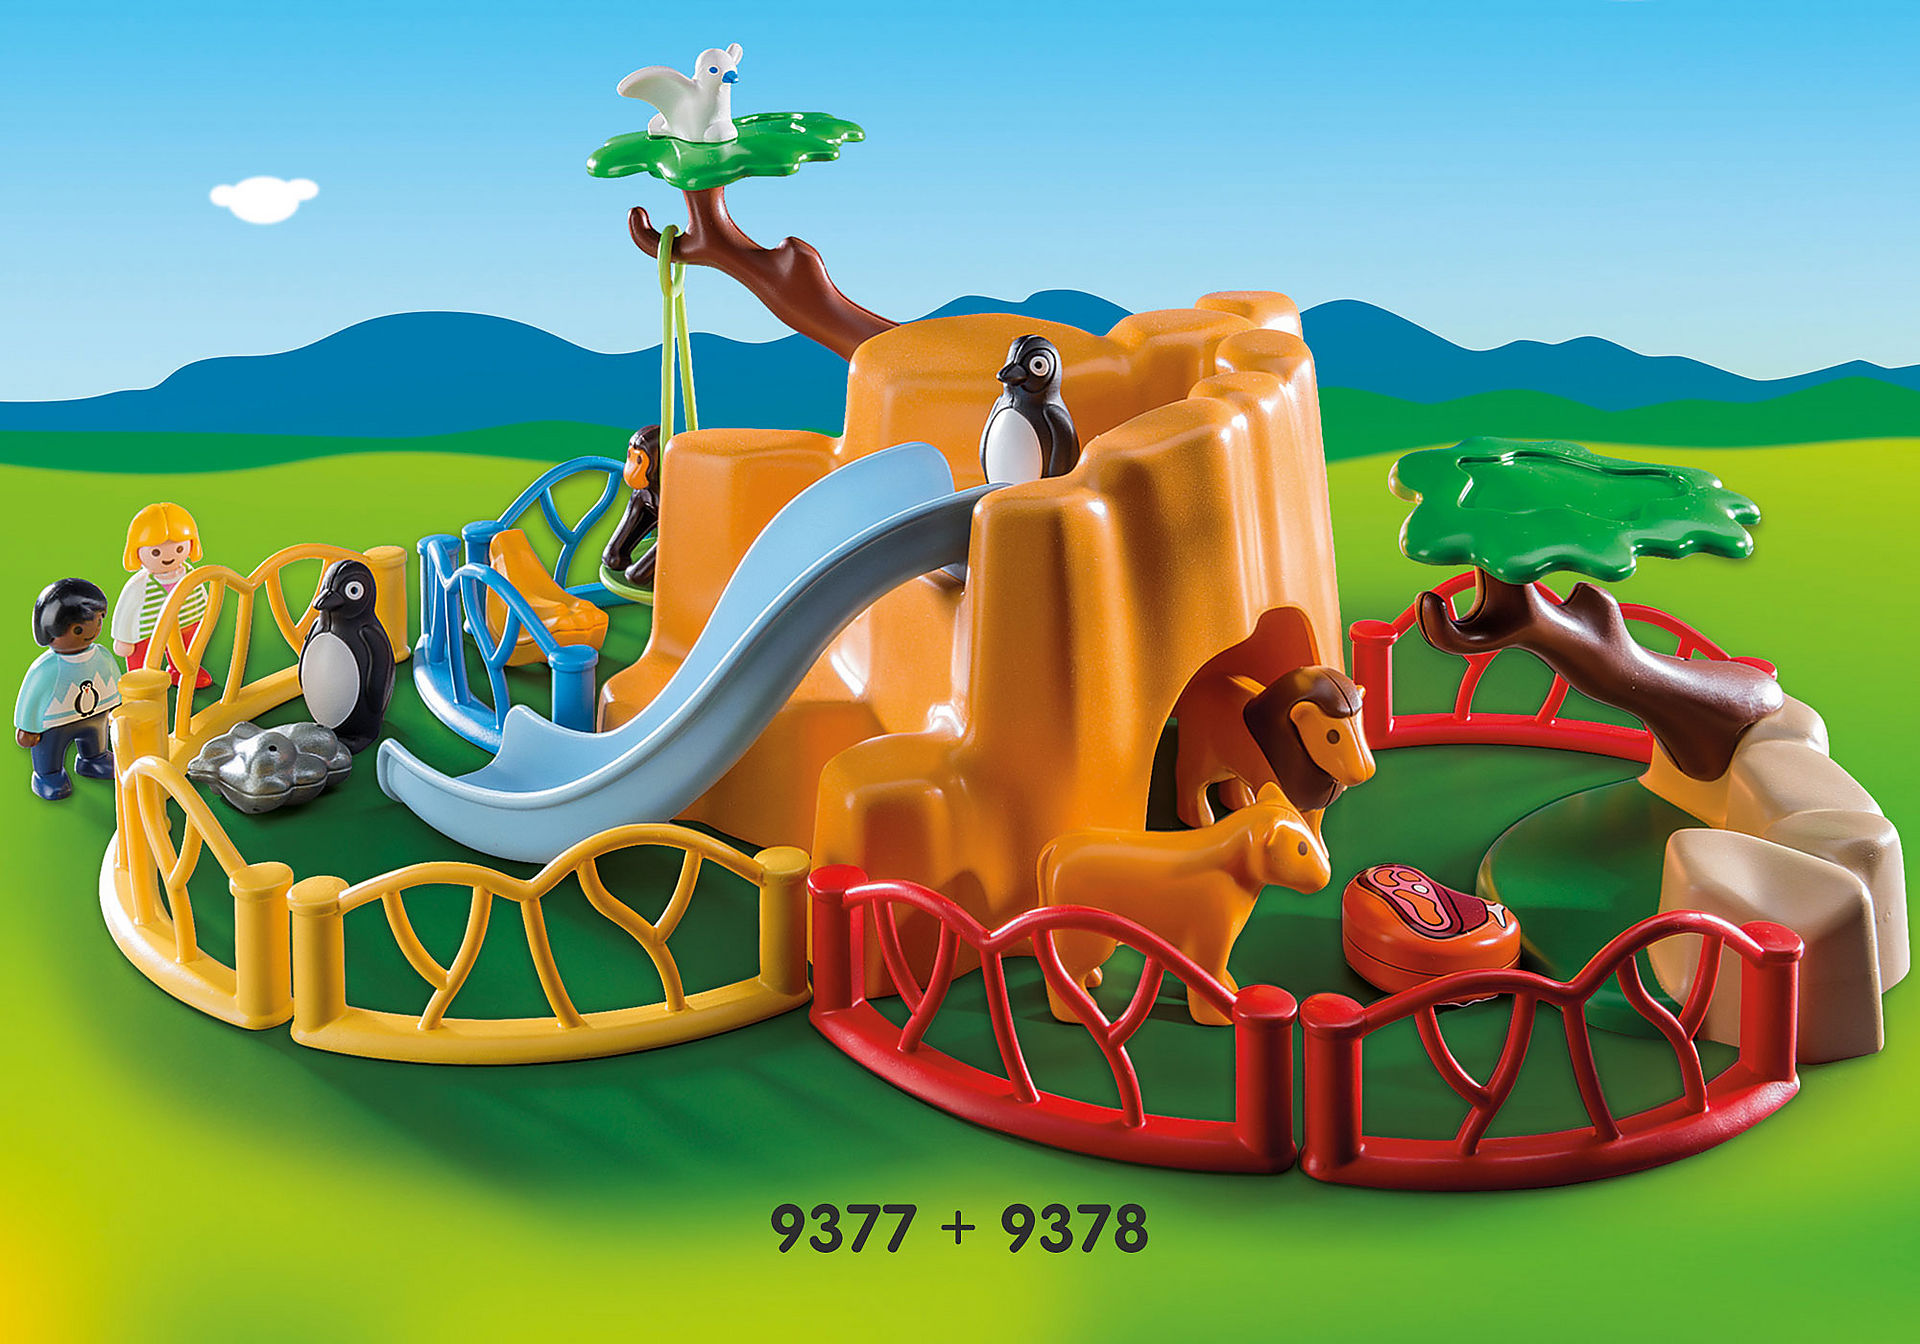 http://media.playmobil.com/i/playmobil/9378_product_extra1/Λιοντάρια Ζωολογικού Κήπου με περίφραξη